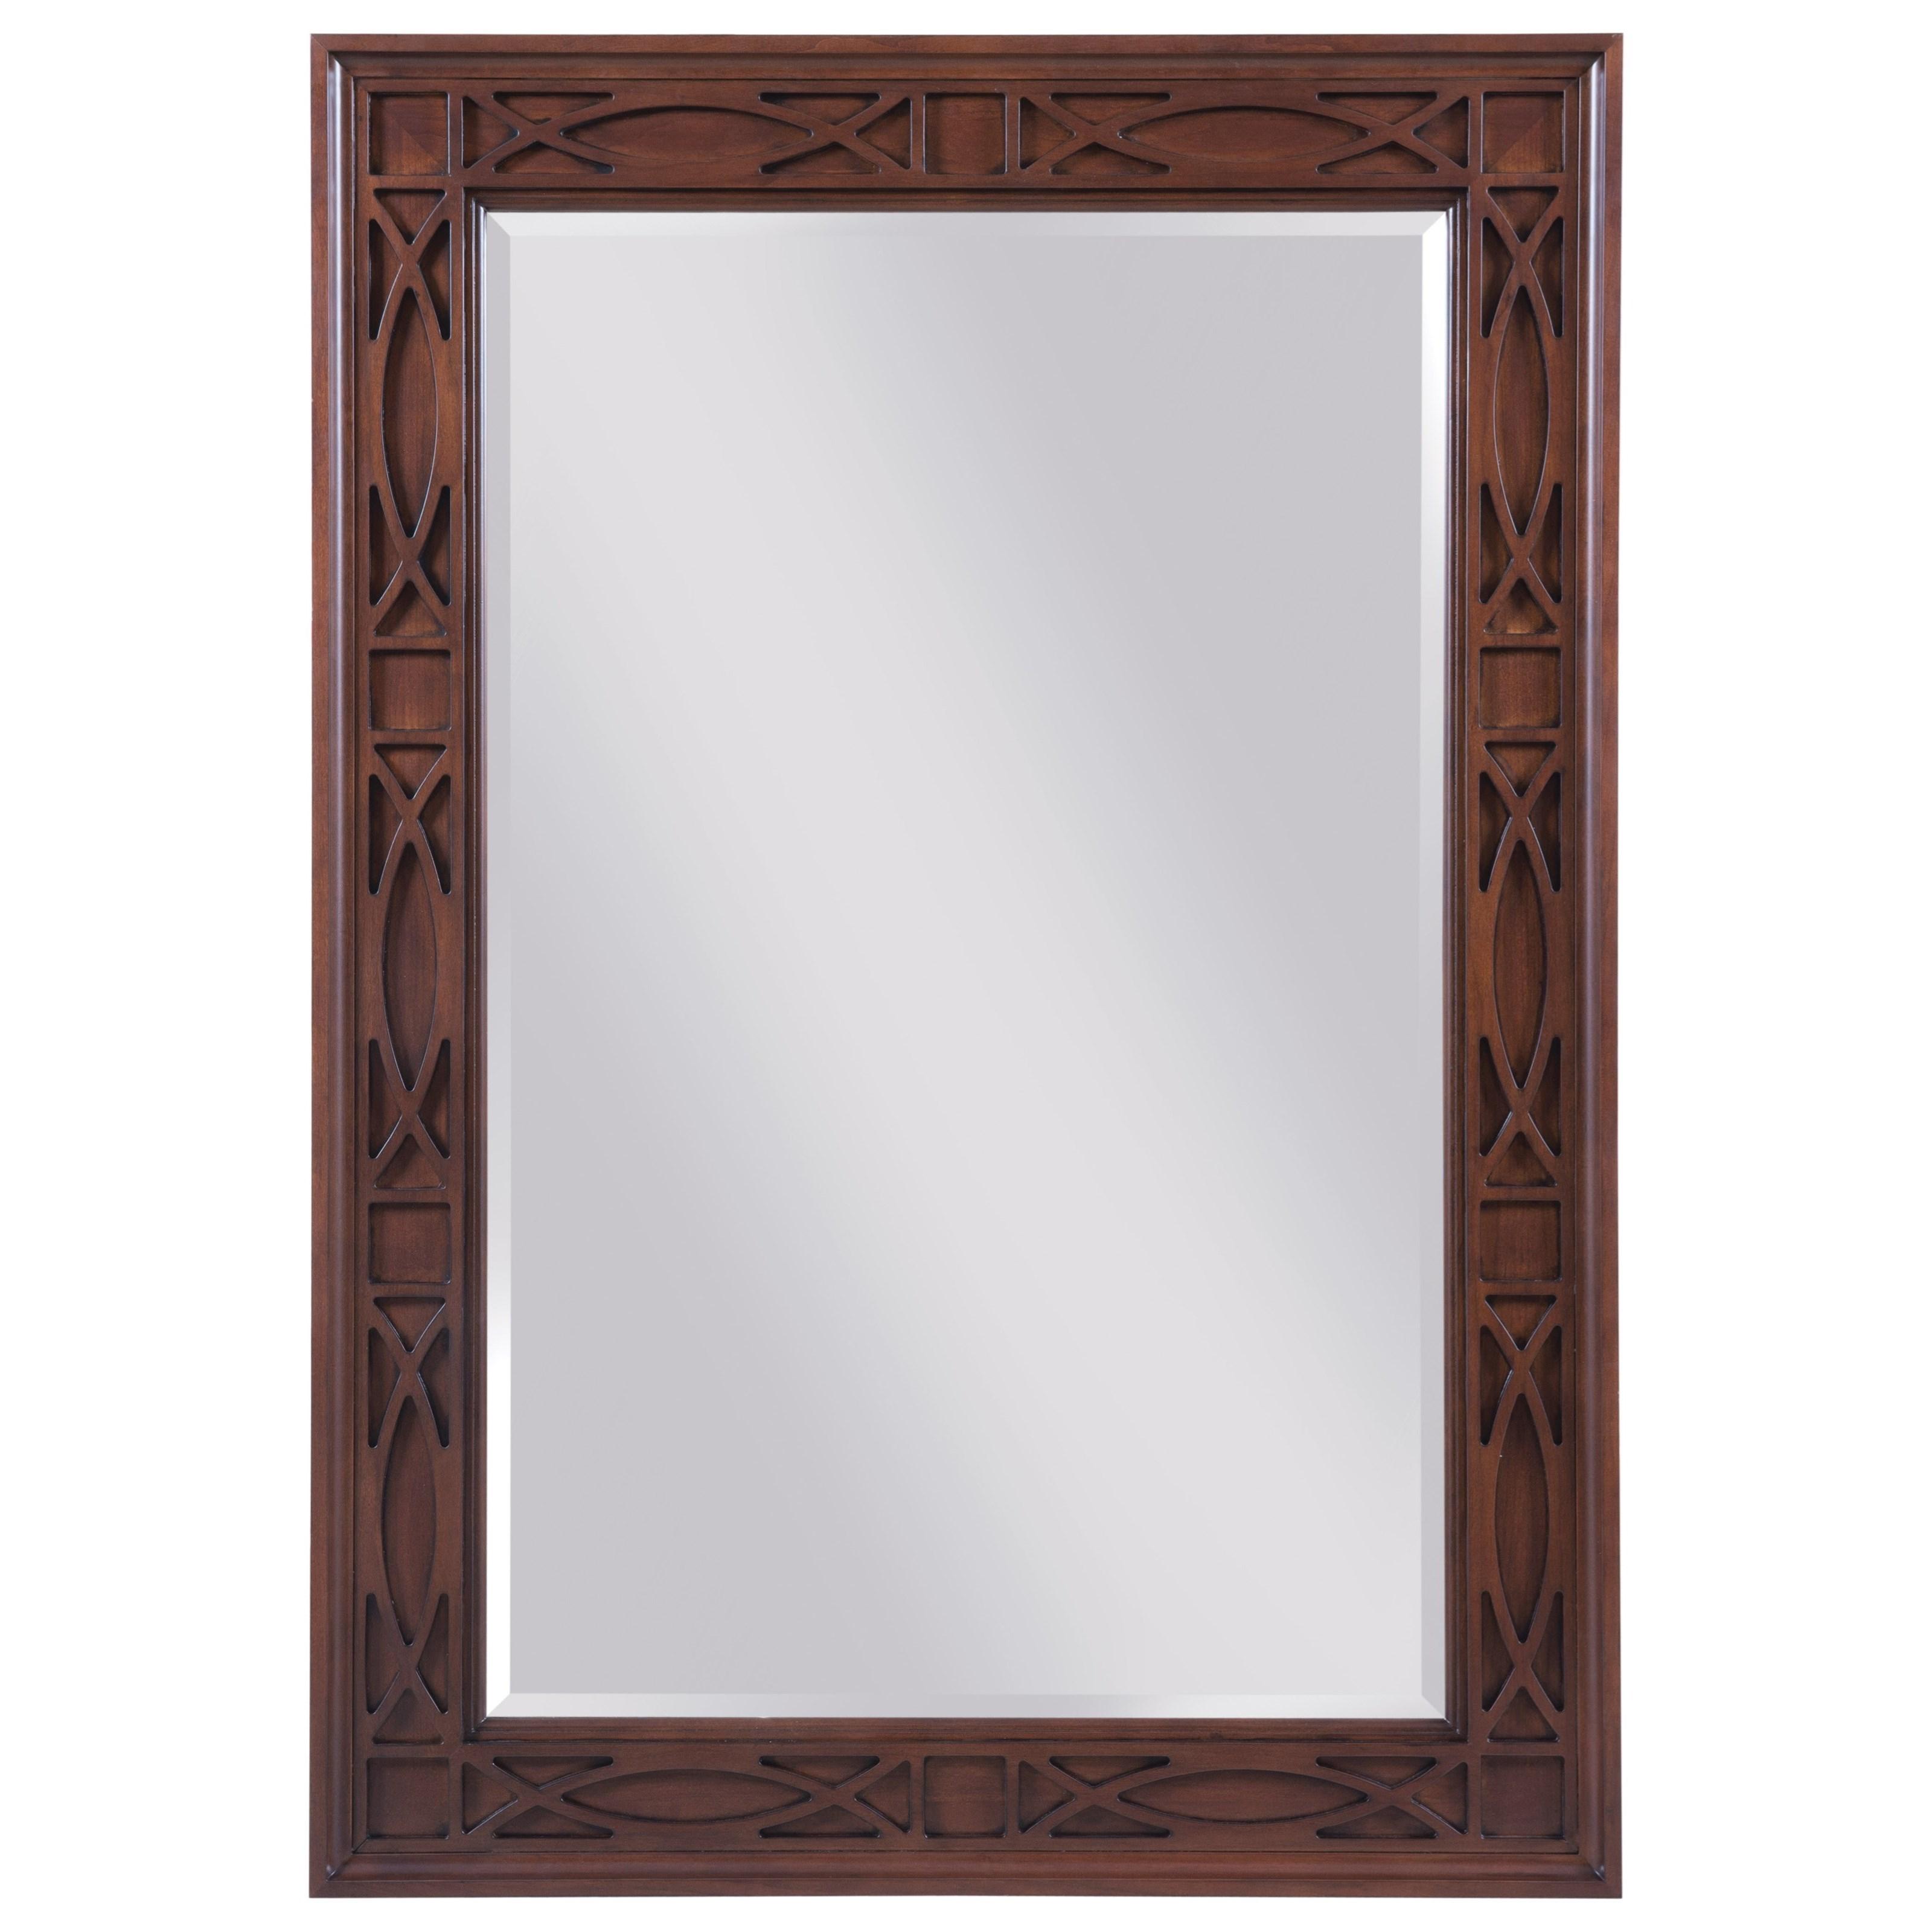 Kincaid furniture hadleigh 607 032 traditional rectangular for Traditional mirror